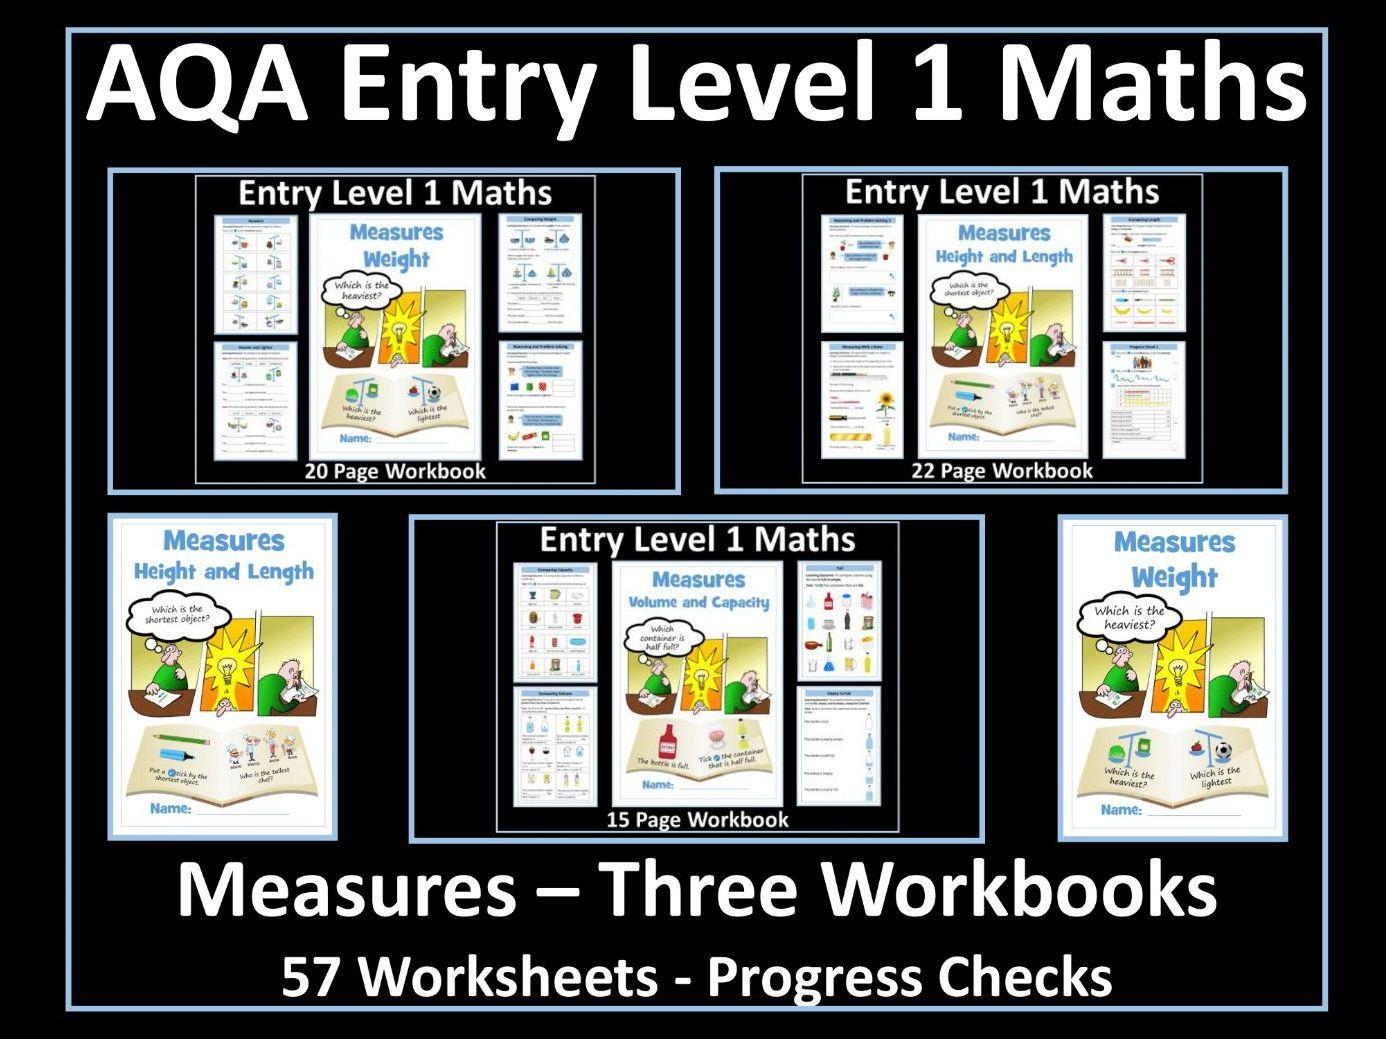 Measures: AQA Entry Level 1 Workbooks